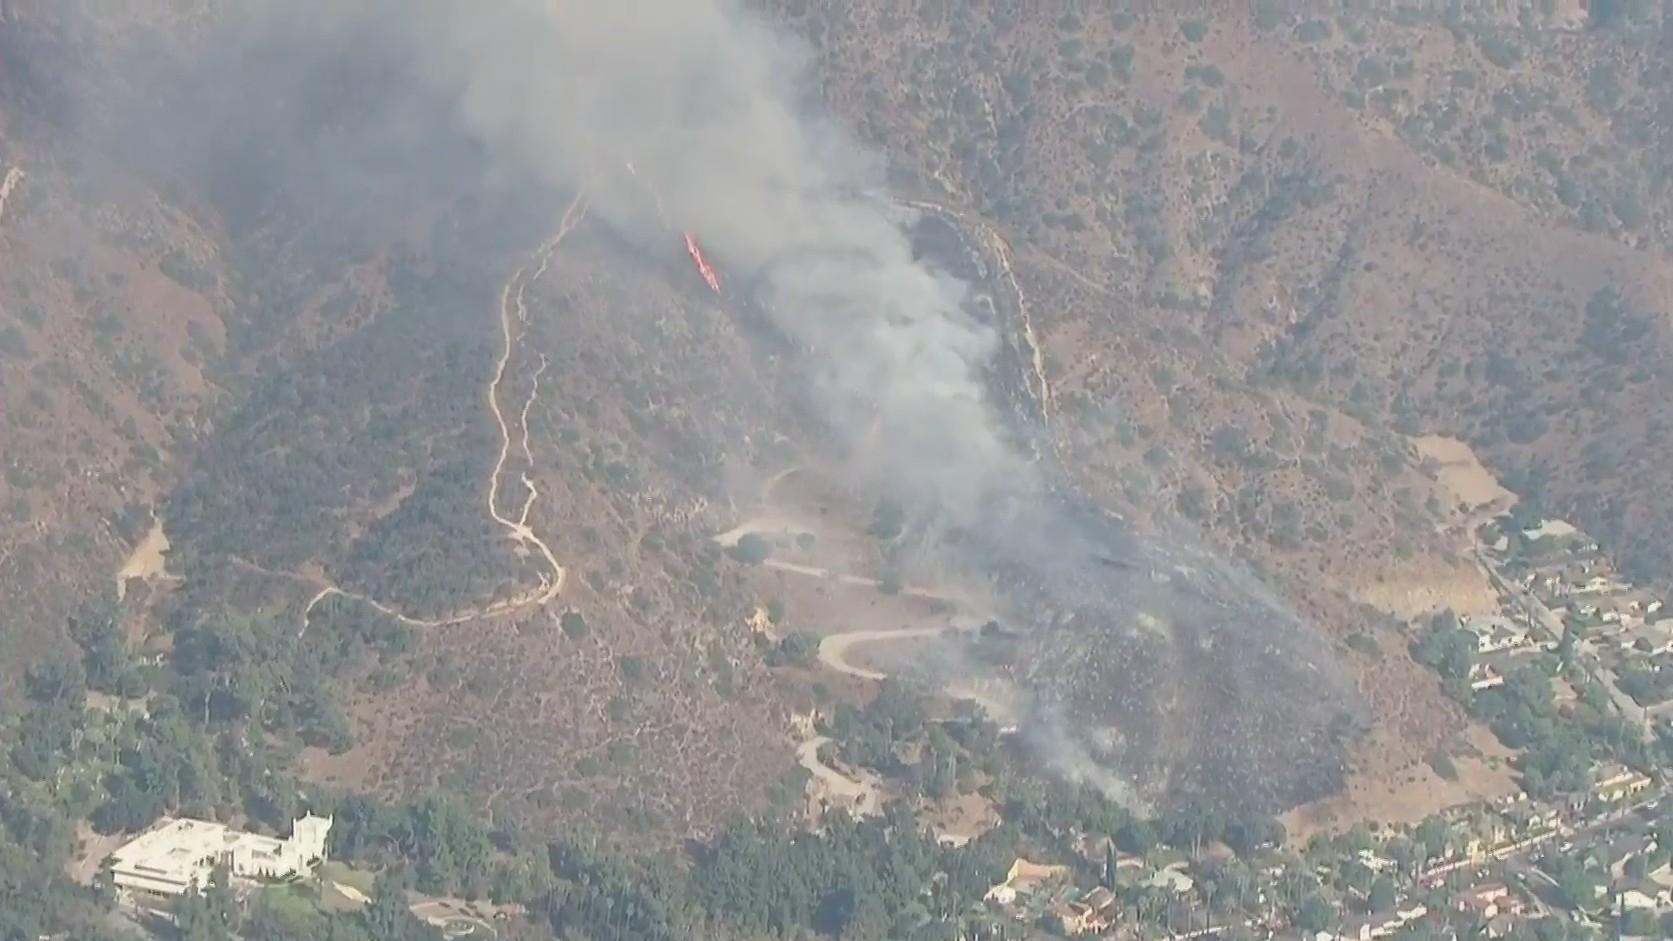 A brush fire spreads near Brand Park in Glendale on Oct. 27, 2020. (KTLA)